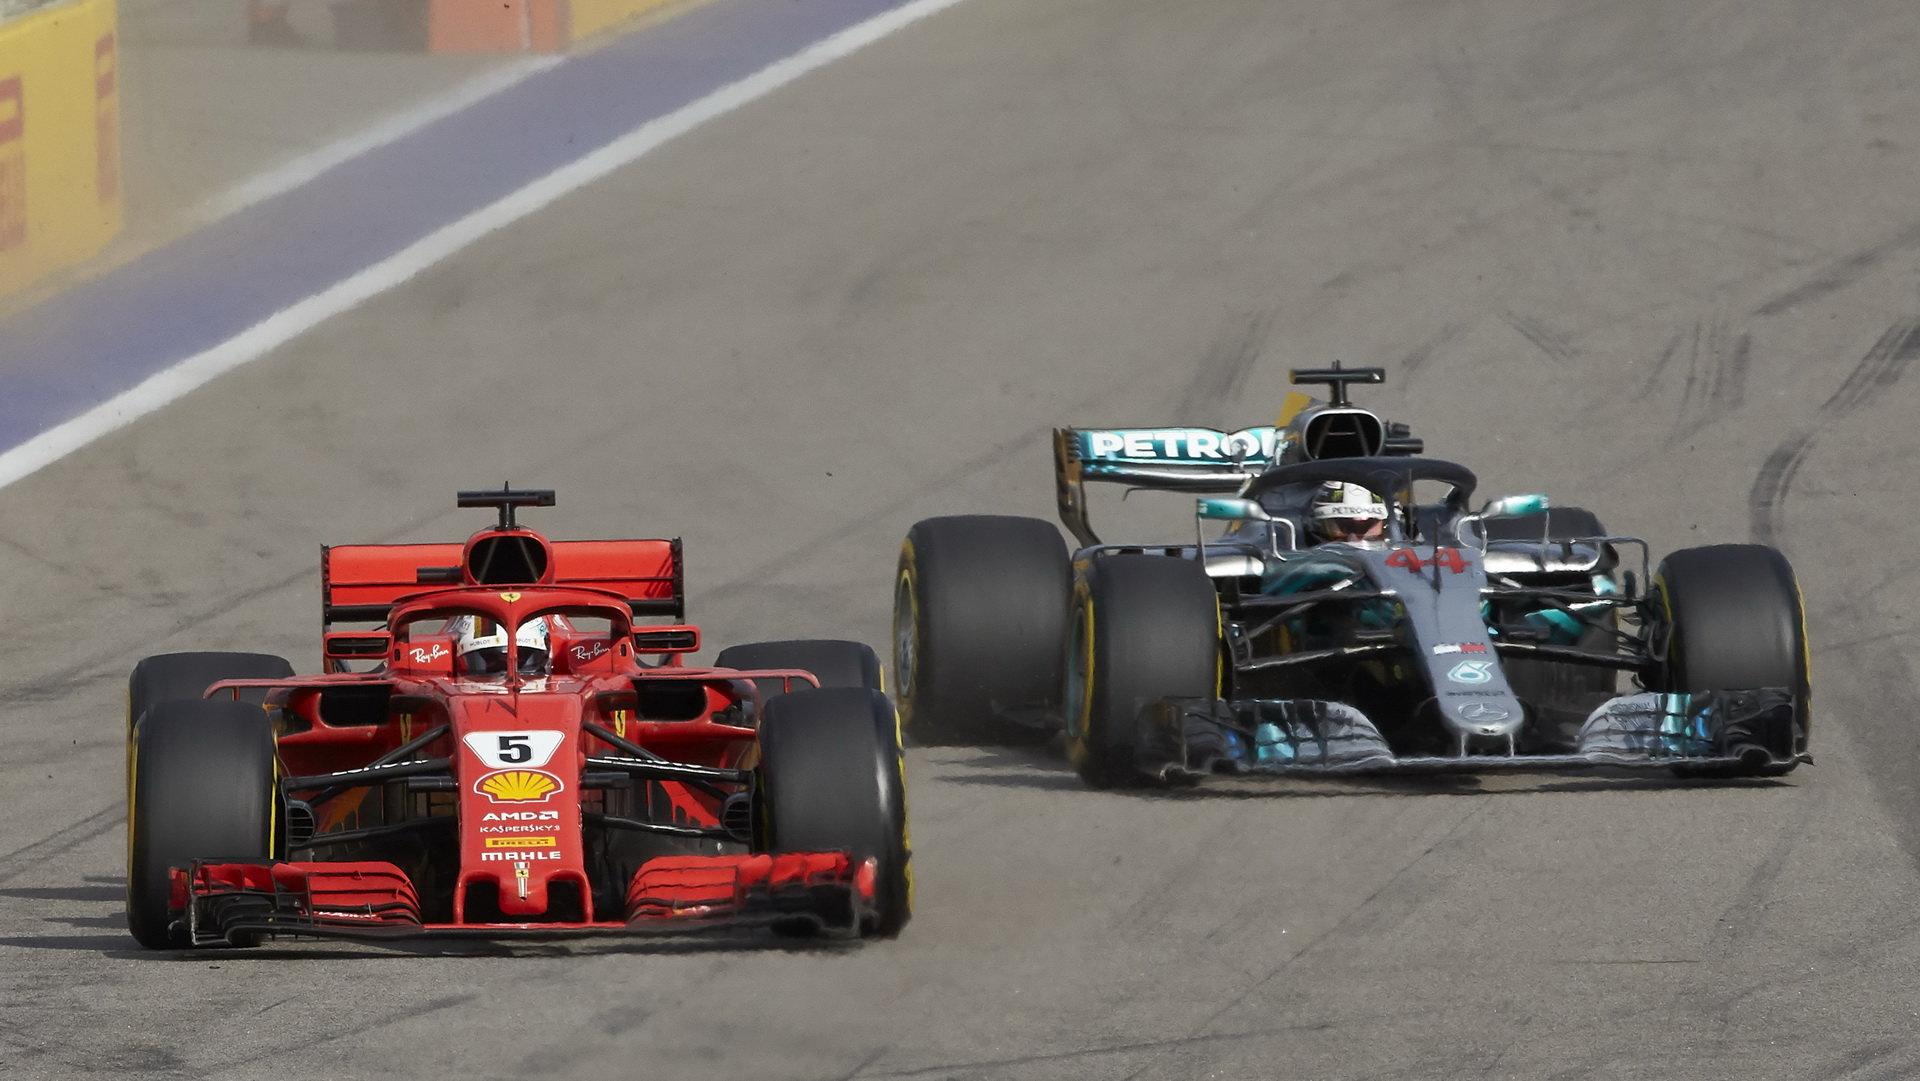 Ferrari zvyšuje rozpočet, chce sesadit Mercedes z trůnu